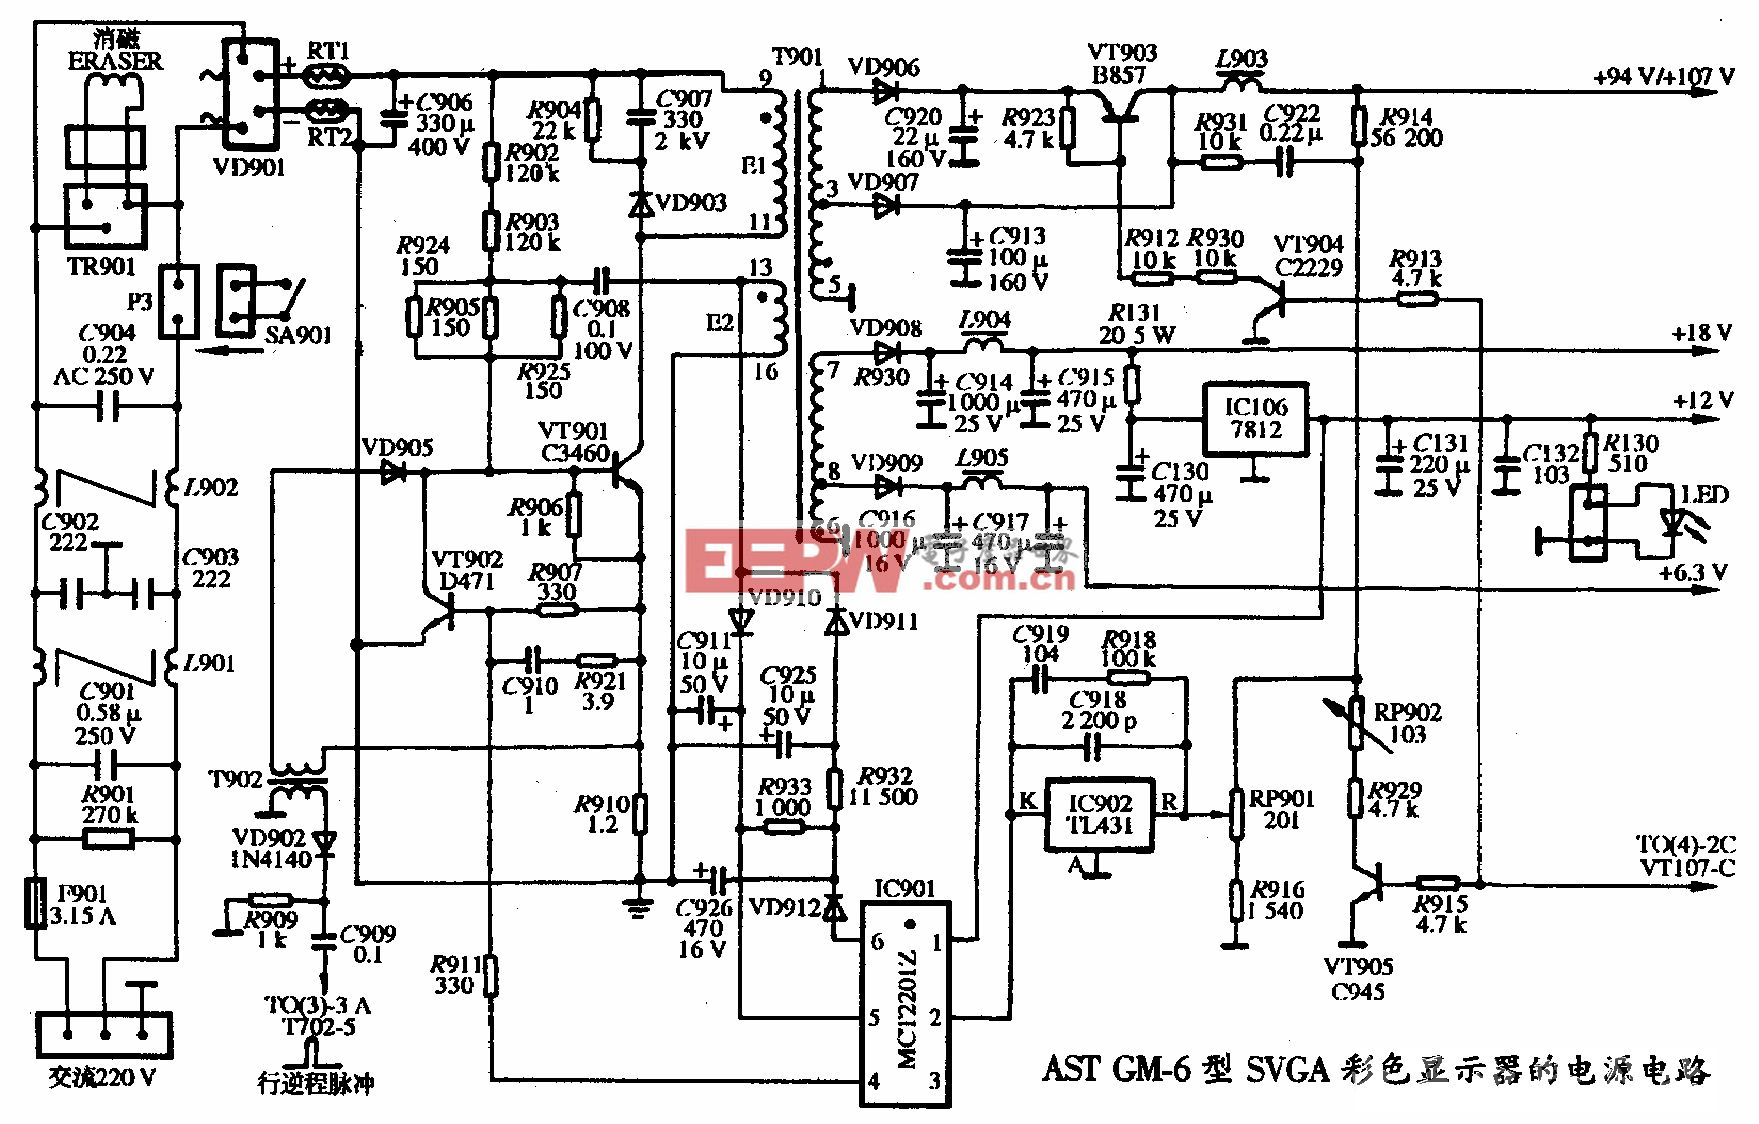 AST GM-6型SVGA彩色显示器的电源电路图